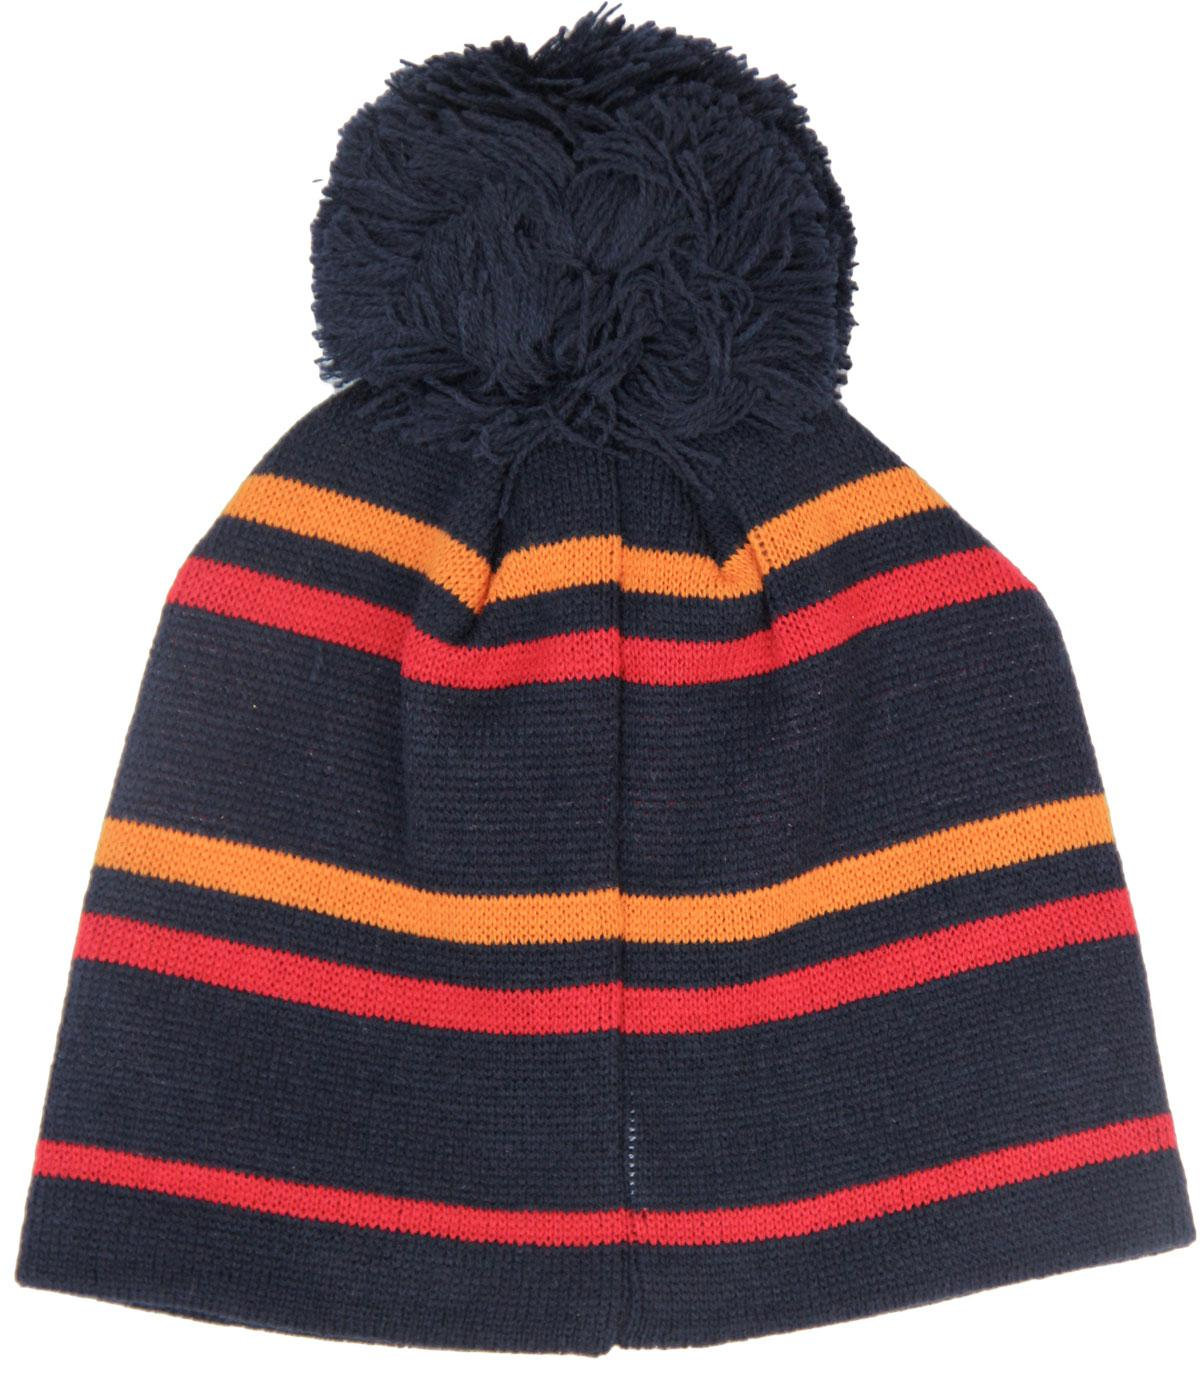 119315ea Ettore ELLESSE Retro 80s Bobble Hat In Navy